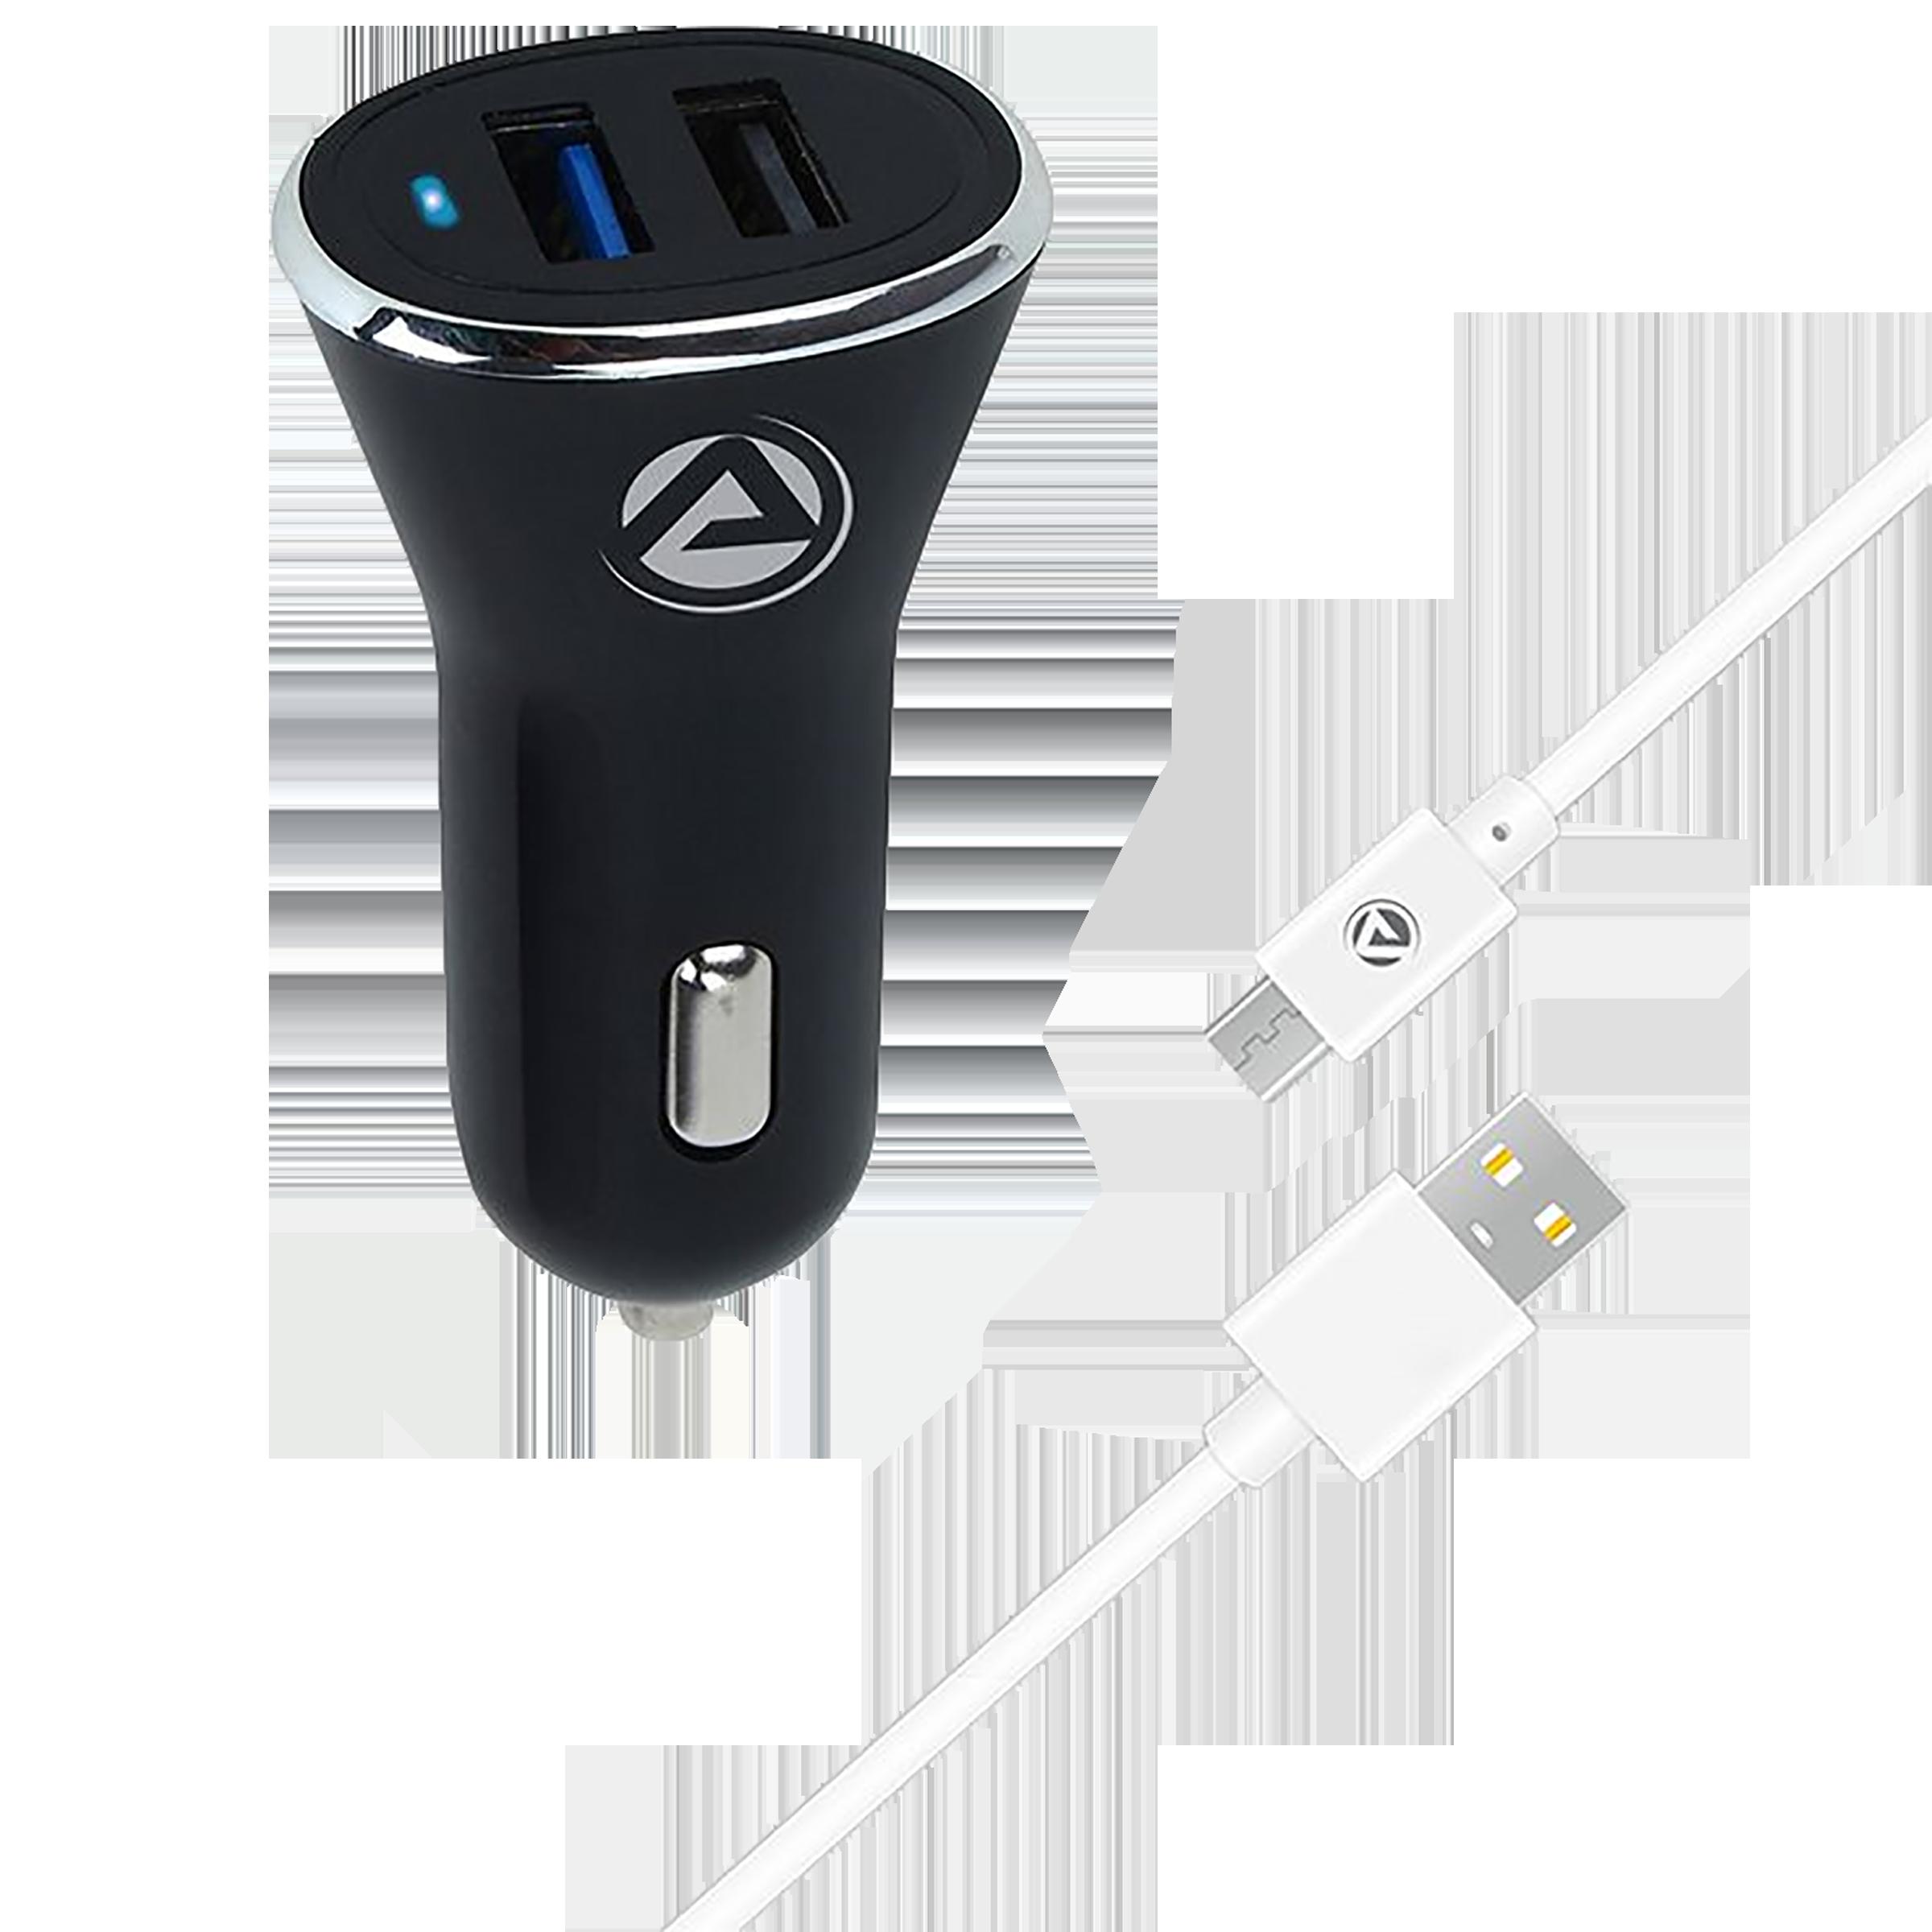 ARU 24 Watts 2 USB Ports Car Charging Adapter (Fast Charging, AQC-24, Black)_1